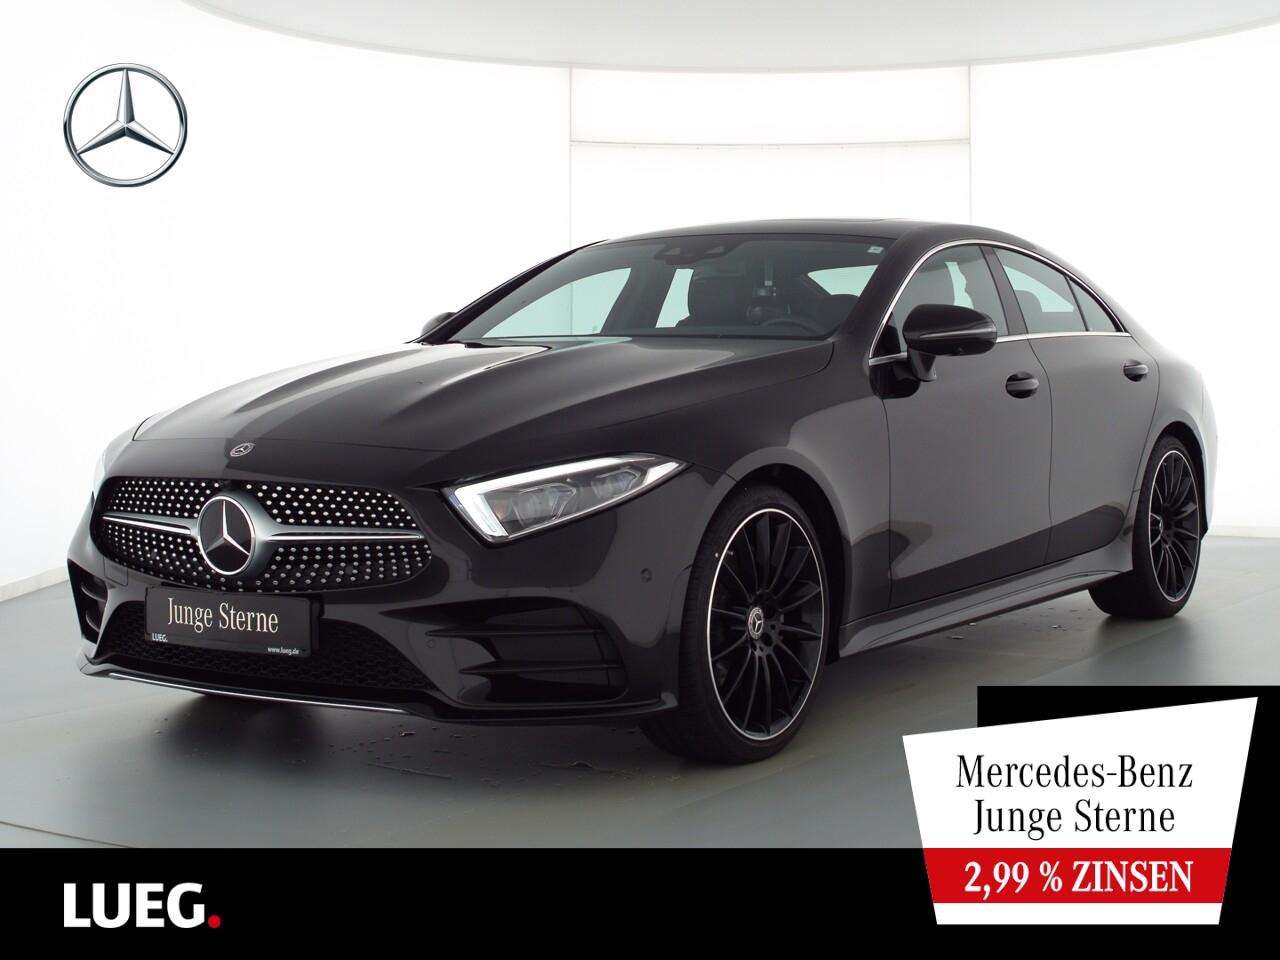 Mercedes-Benz CLS 220 d AMG+MBUX+SHD+Mbeam+Distr+20''+Mem+360G, Jahr 2019, Diesel